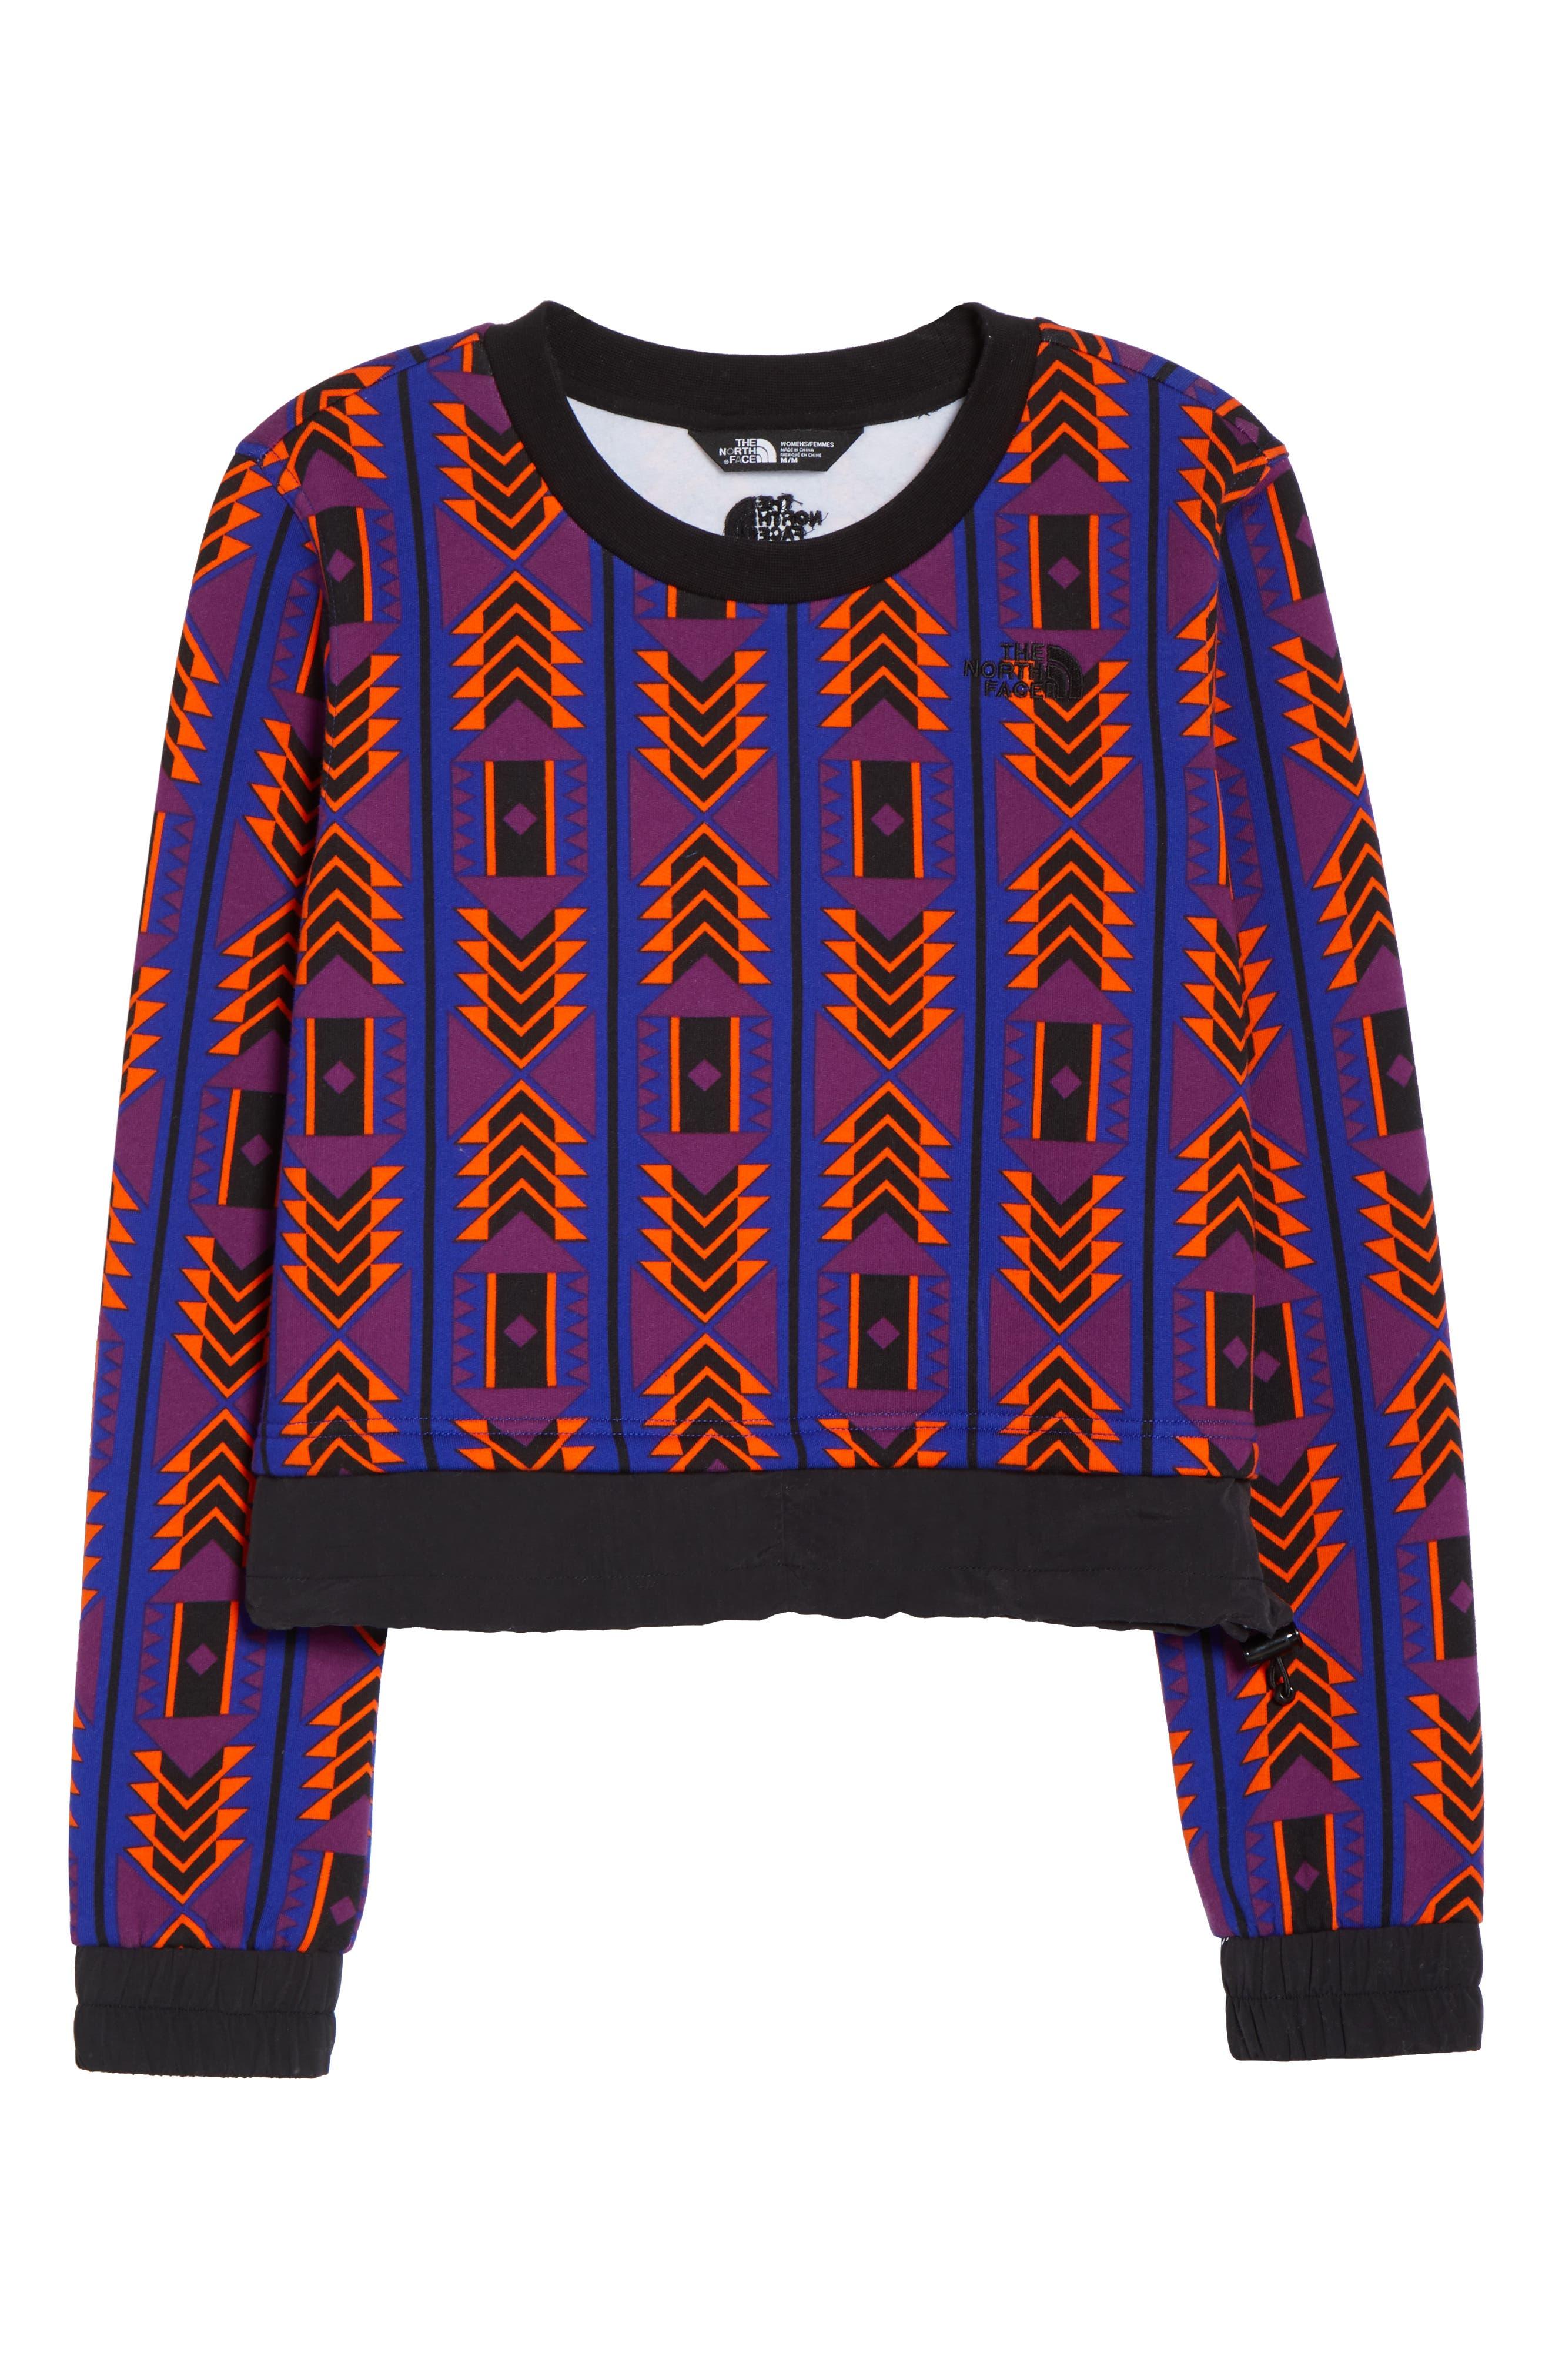 92 Rage Crop Fleece Sweatshirt,                             Alternate thumbnail 7, color,                             AZTEC BLUE 1992 RAGE PRINT